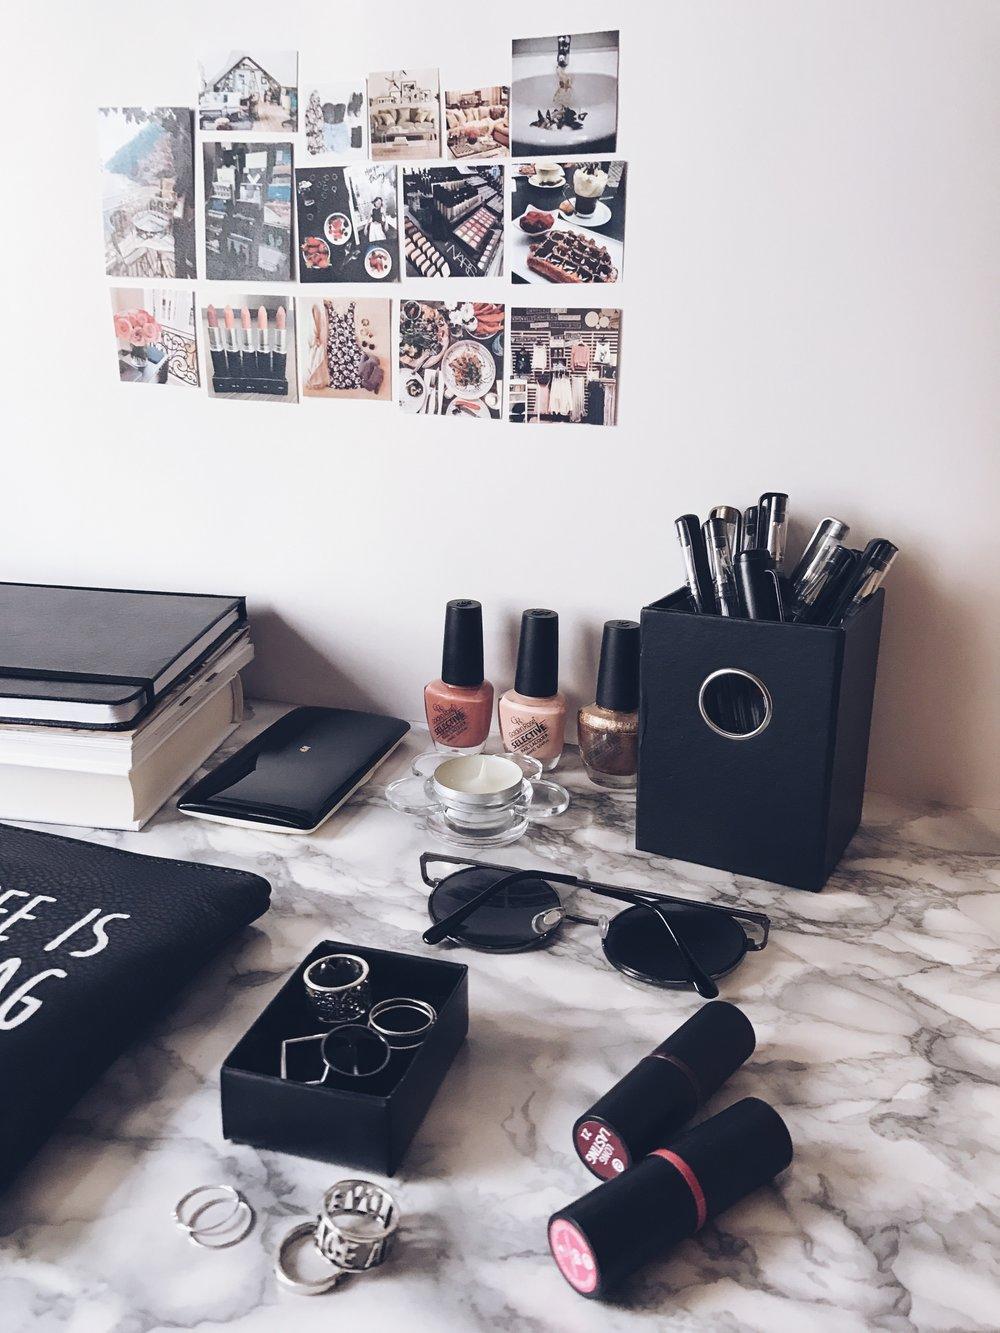 Тефтер: Moleskine    Очила, Пръстени, Сенки за очи: H&M    Козметична чантичка: Tally Weijl    Лакове за нокти: Golden Rose Cosmetics USA    Червила: Essense Cosmetics USA